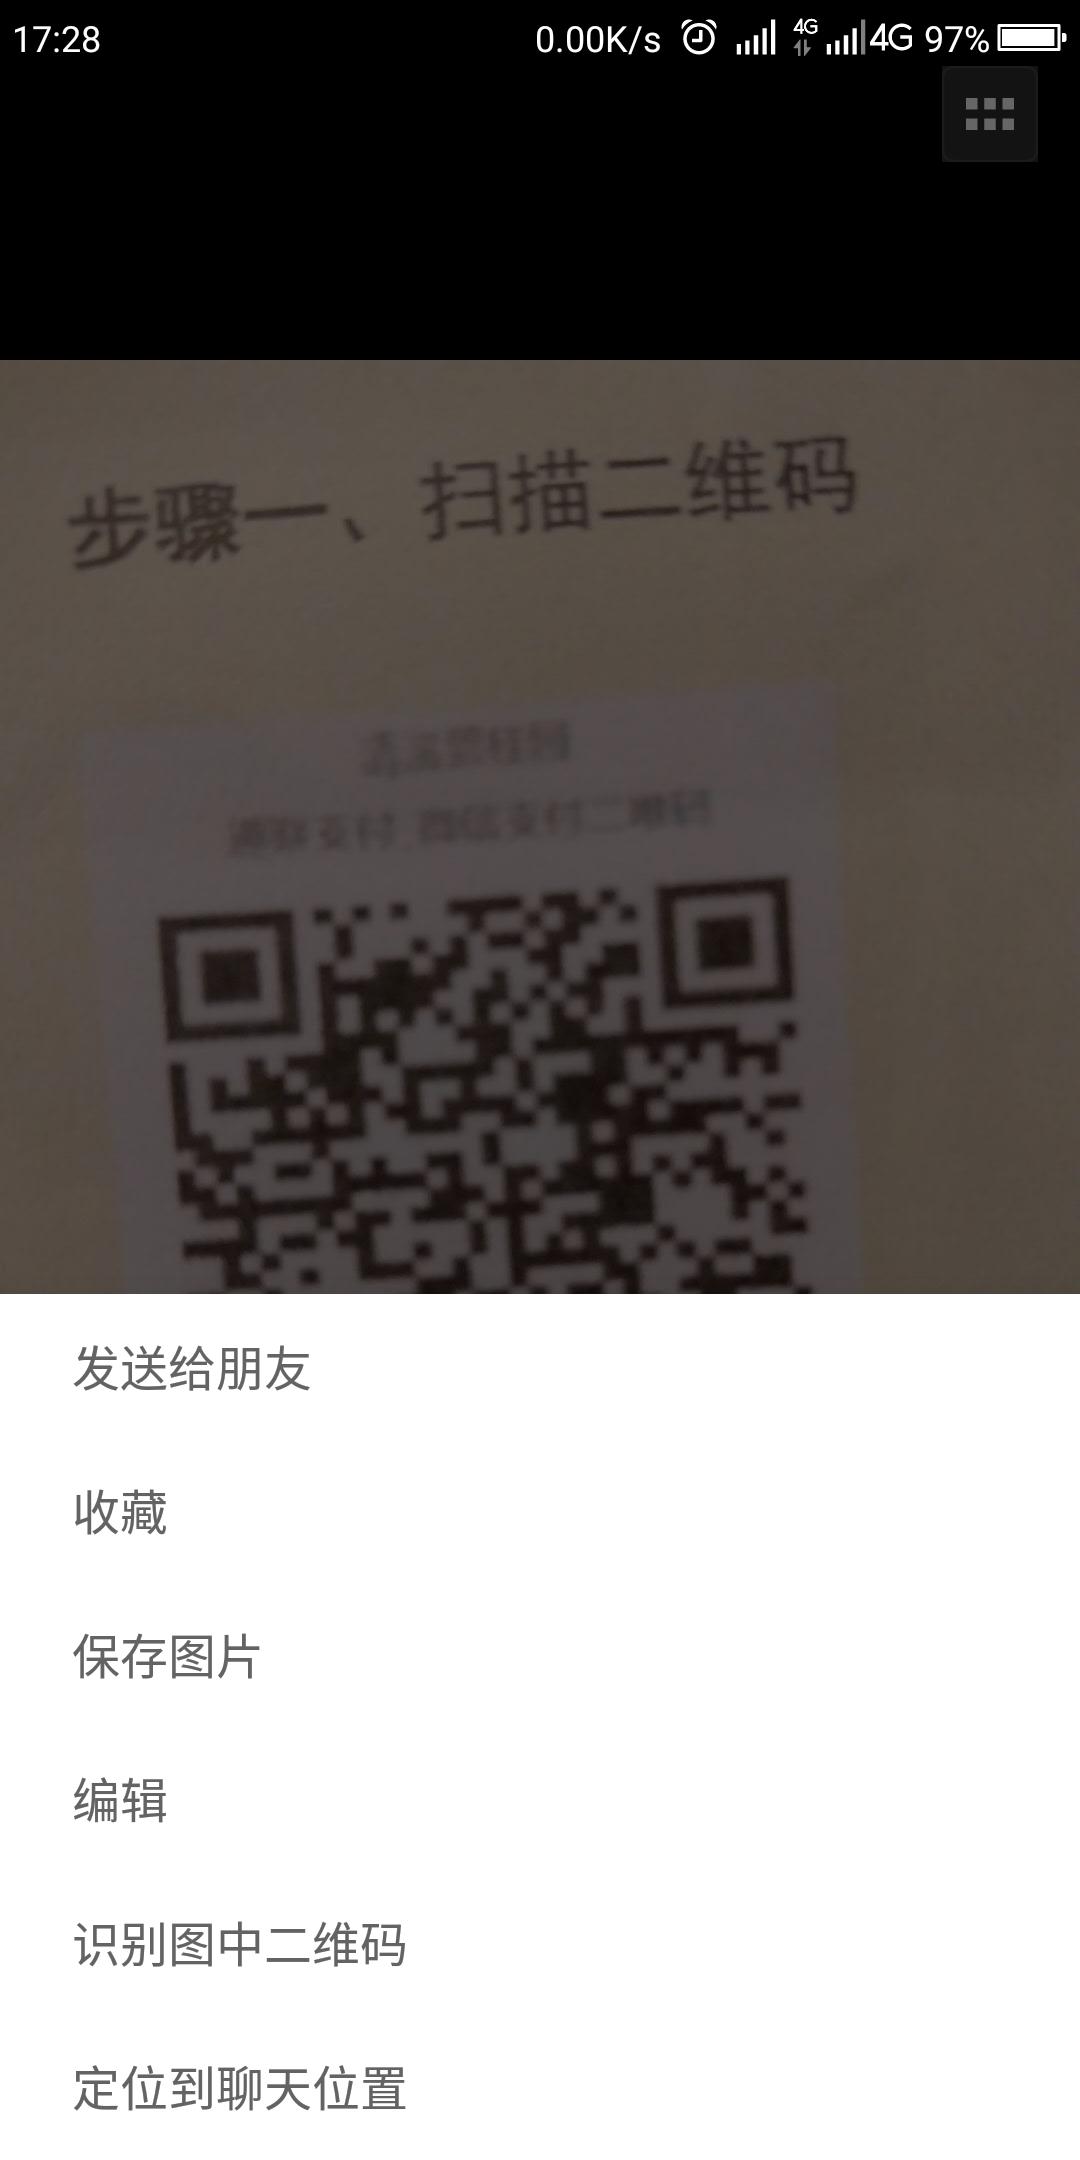 Screenshot_2018-04-16-17-28-17.png